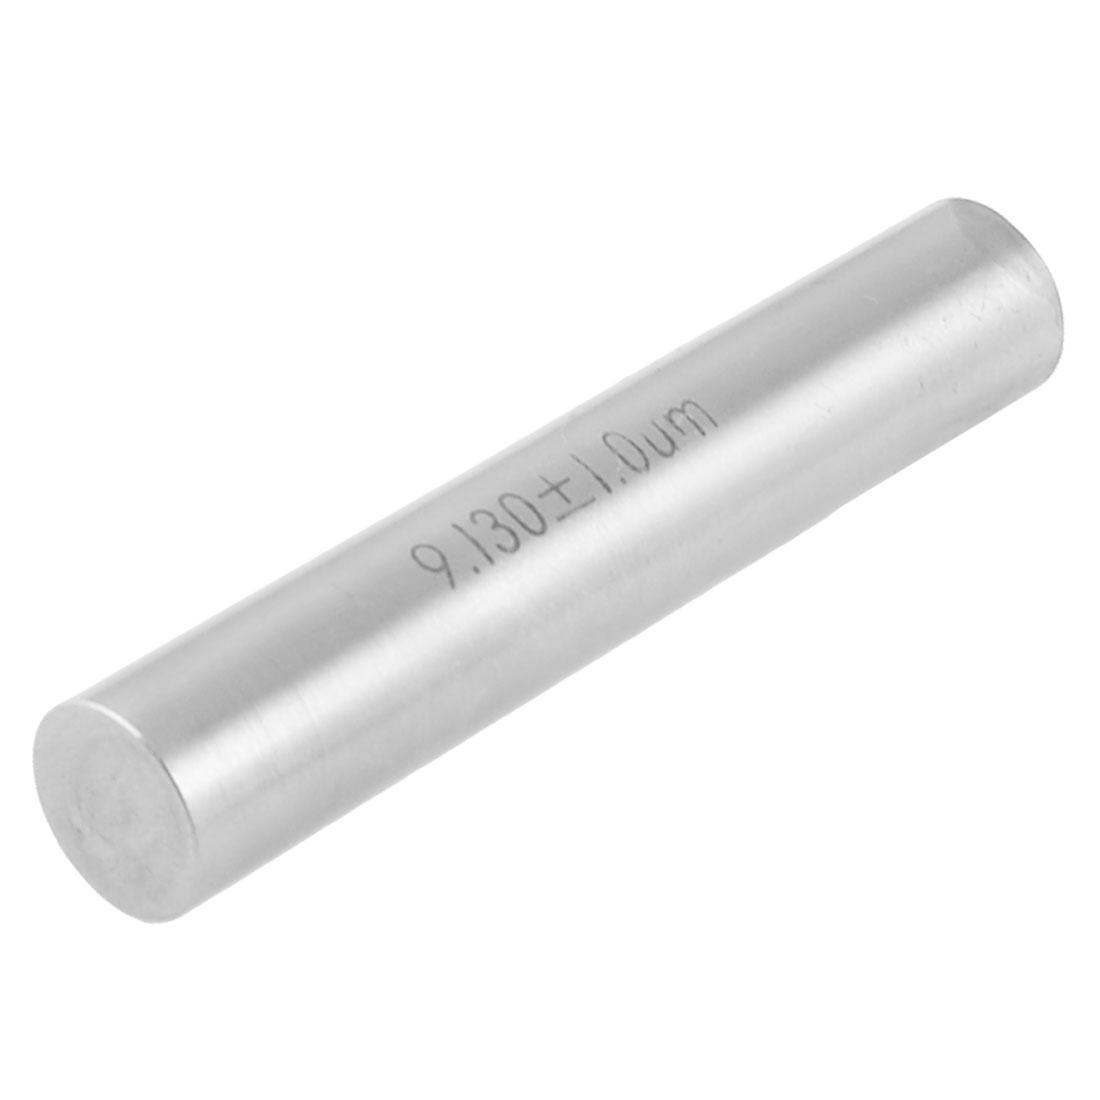 Hole Measuring 9.13mm x 50mm Tungsten Carbide Cylinder Pin Gage Gauge